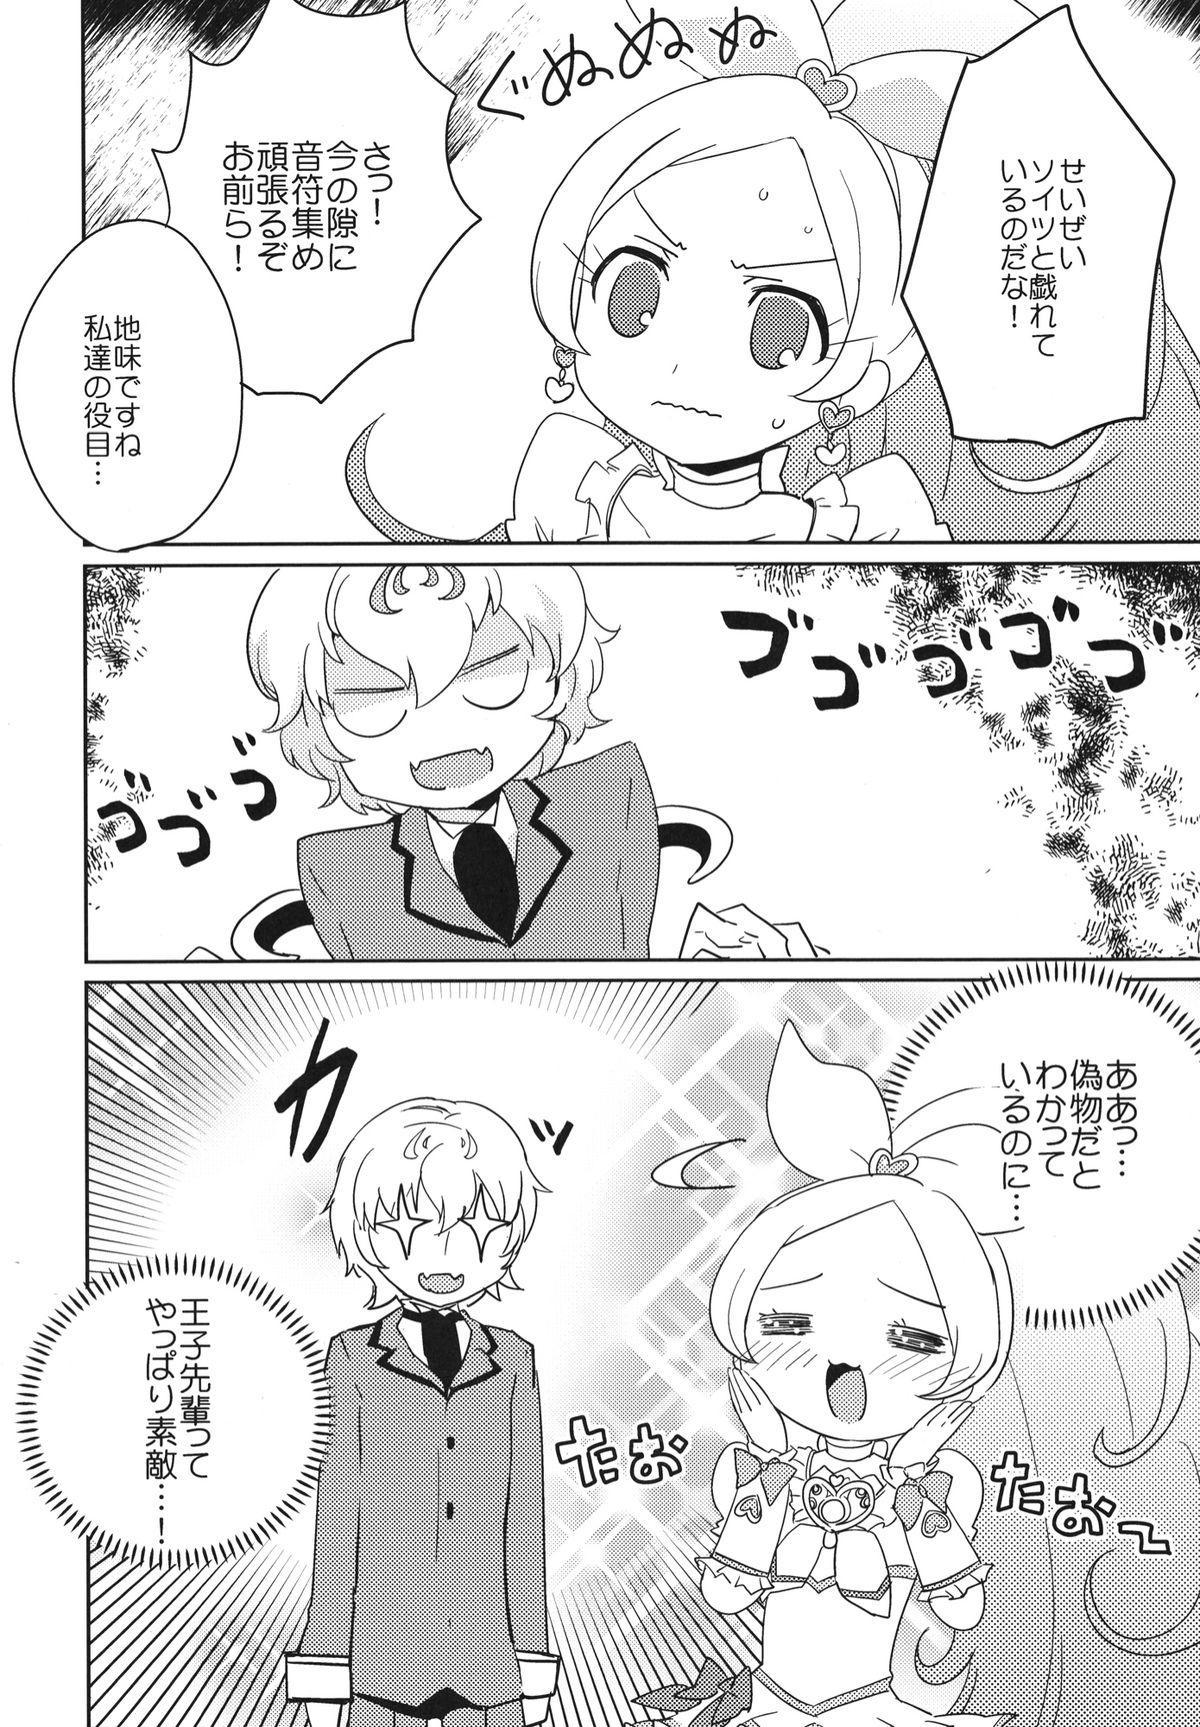 Sanbyoushi! 6